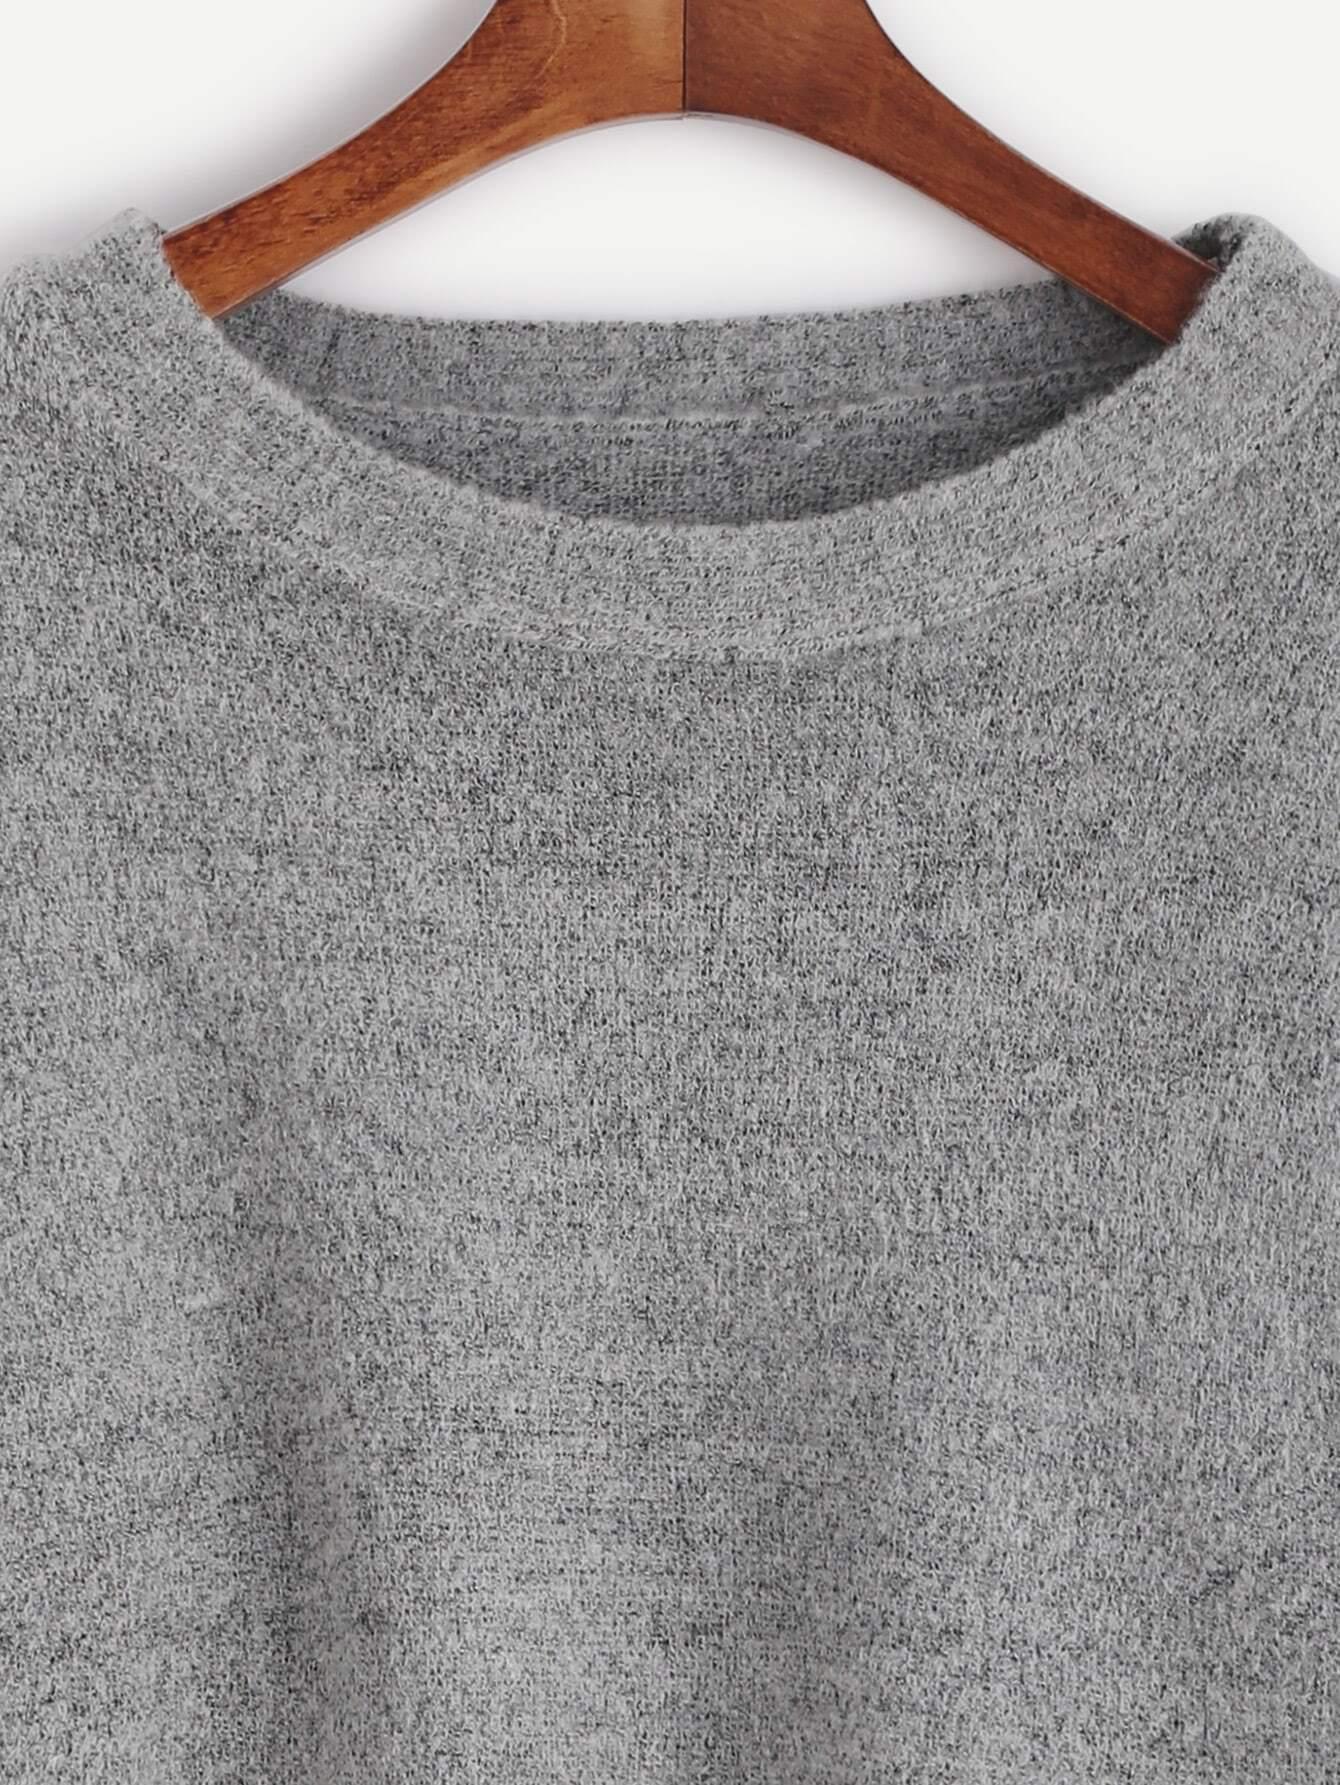 sweater160829453_2